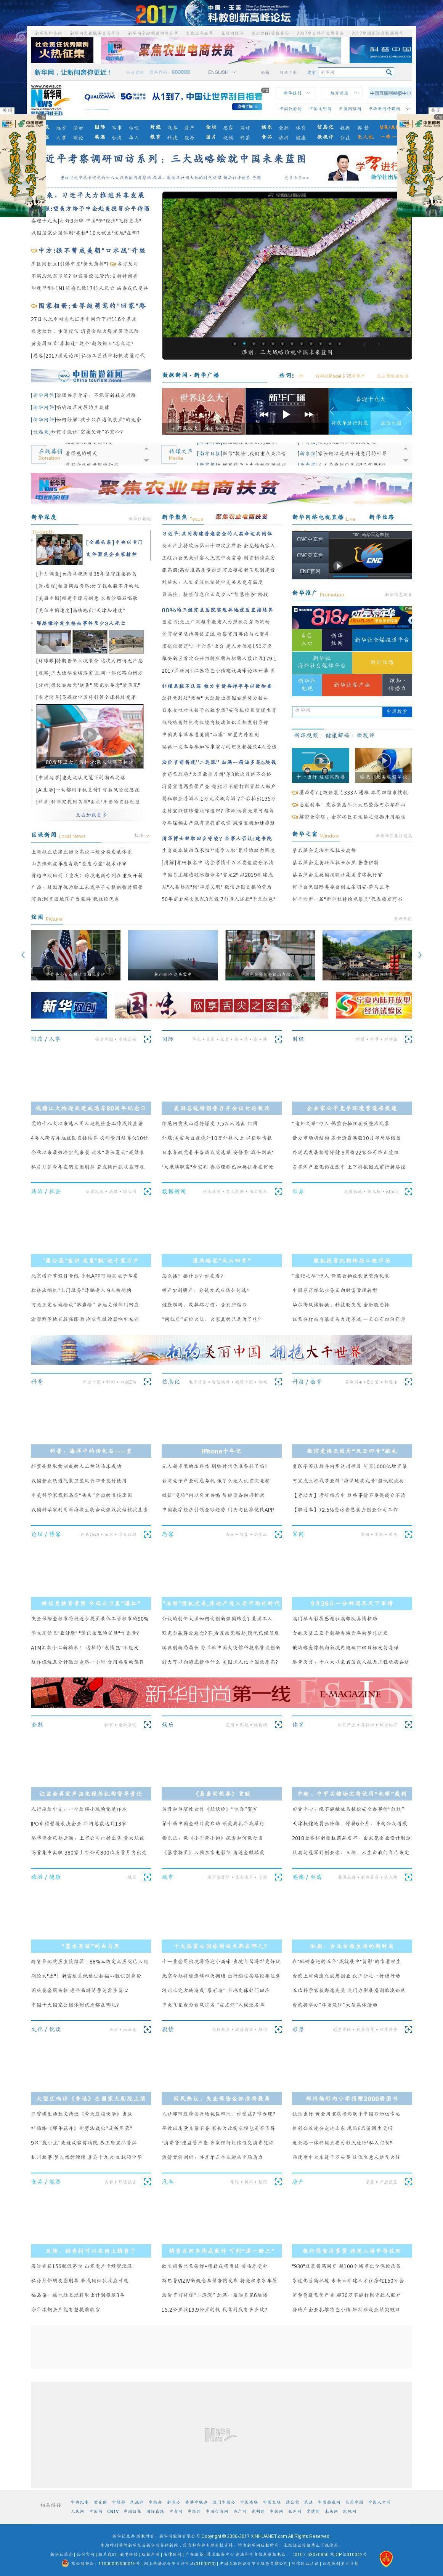 Xinhua at Wednesday Sept. 27, 2017, 2:21 a.m. UTC